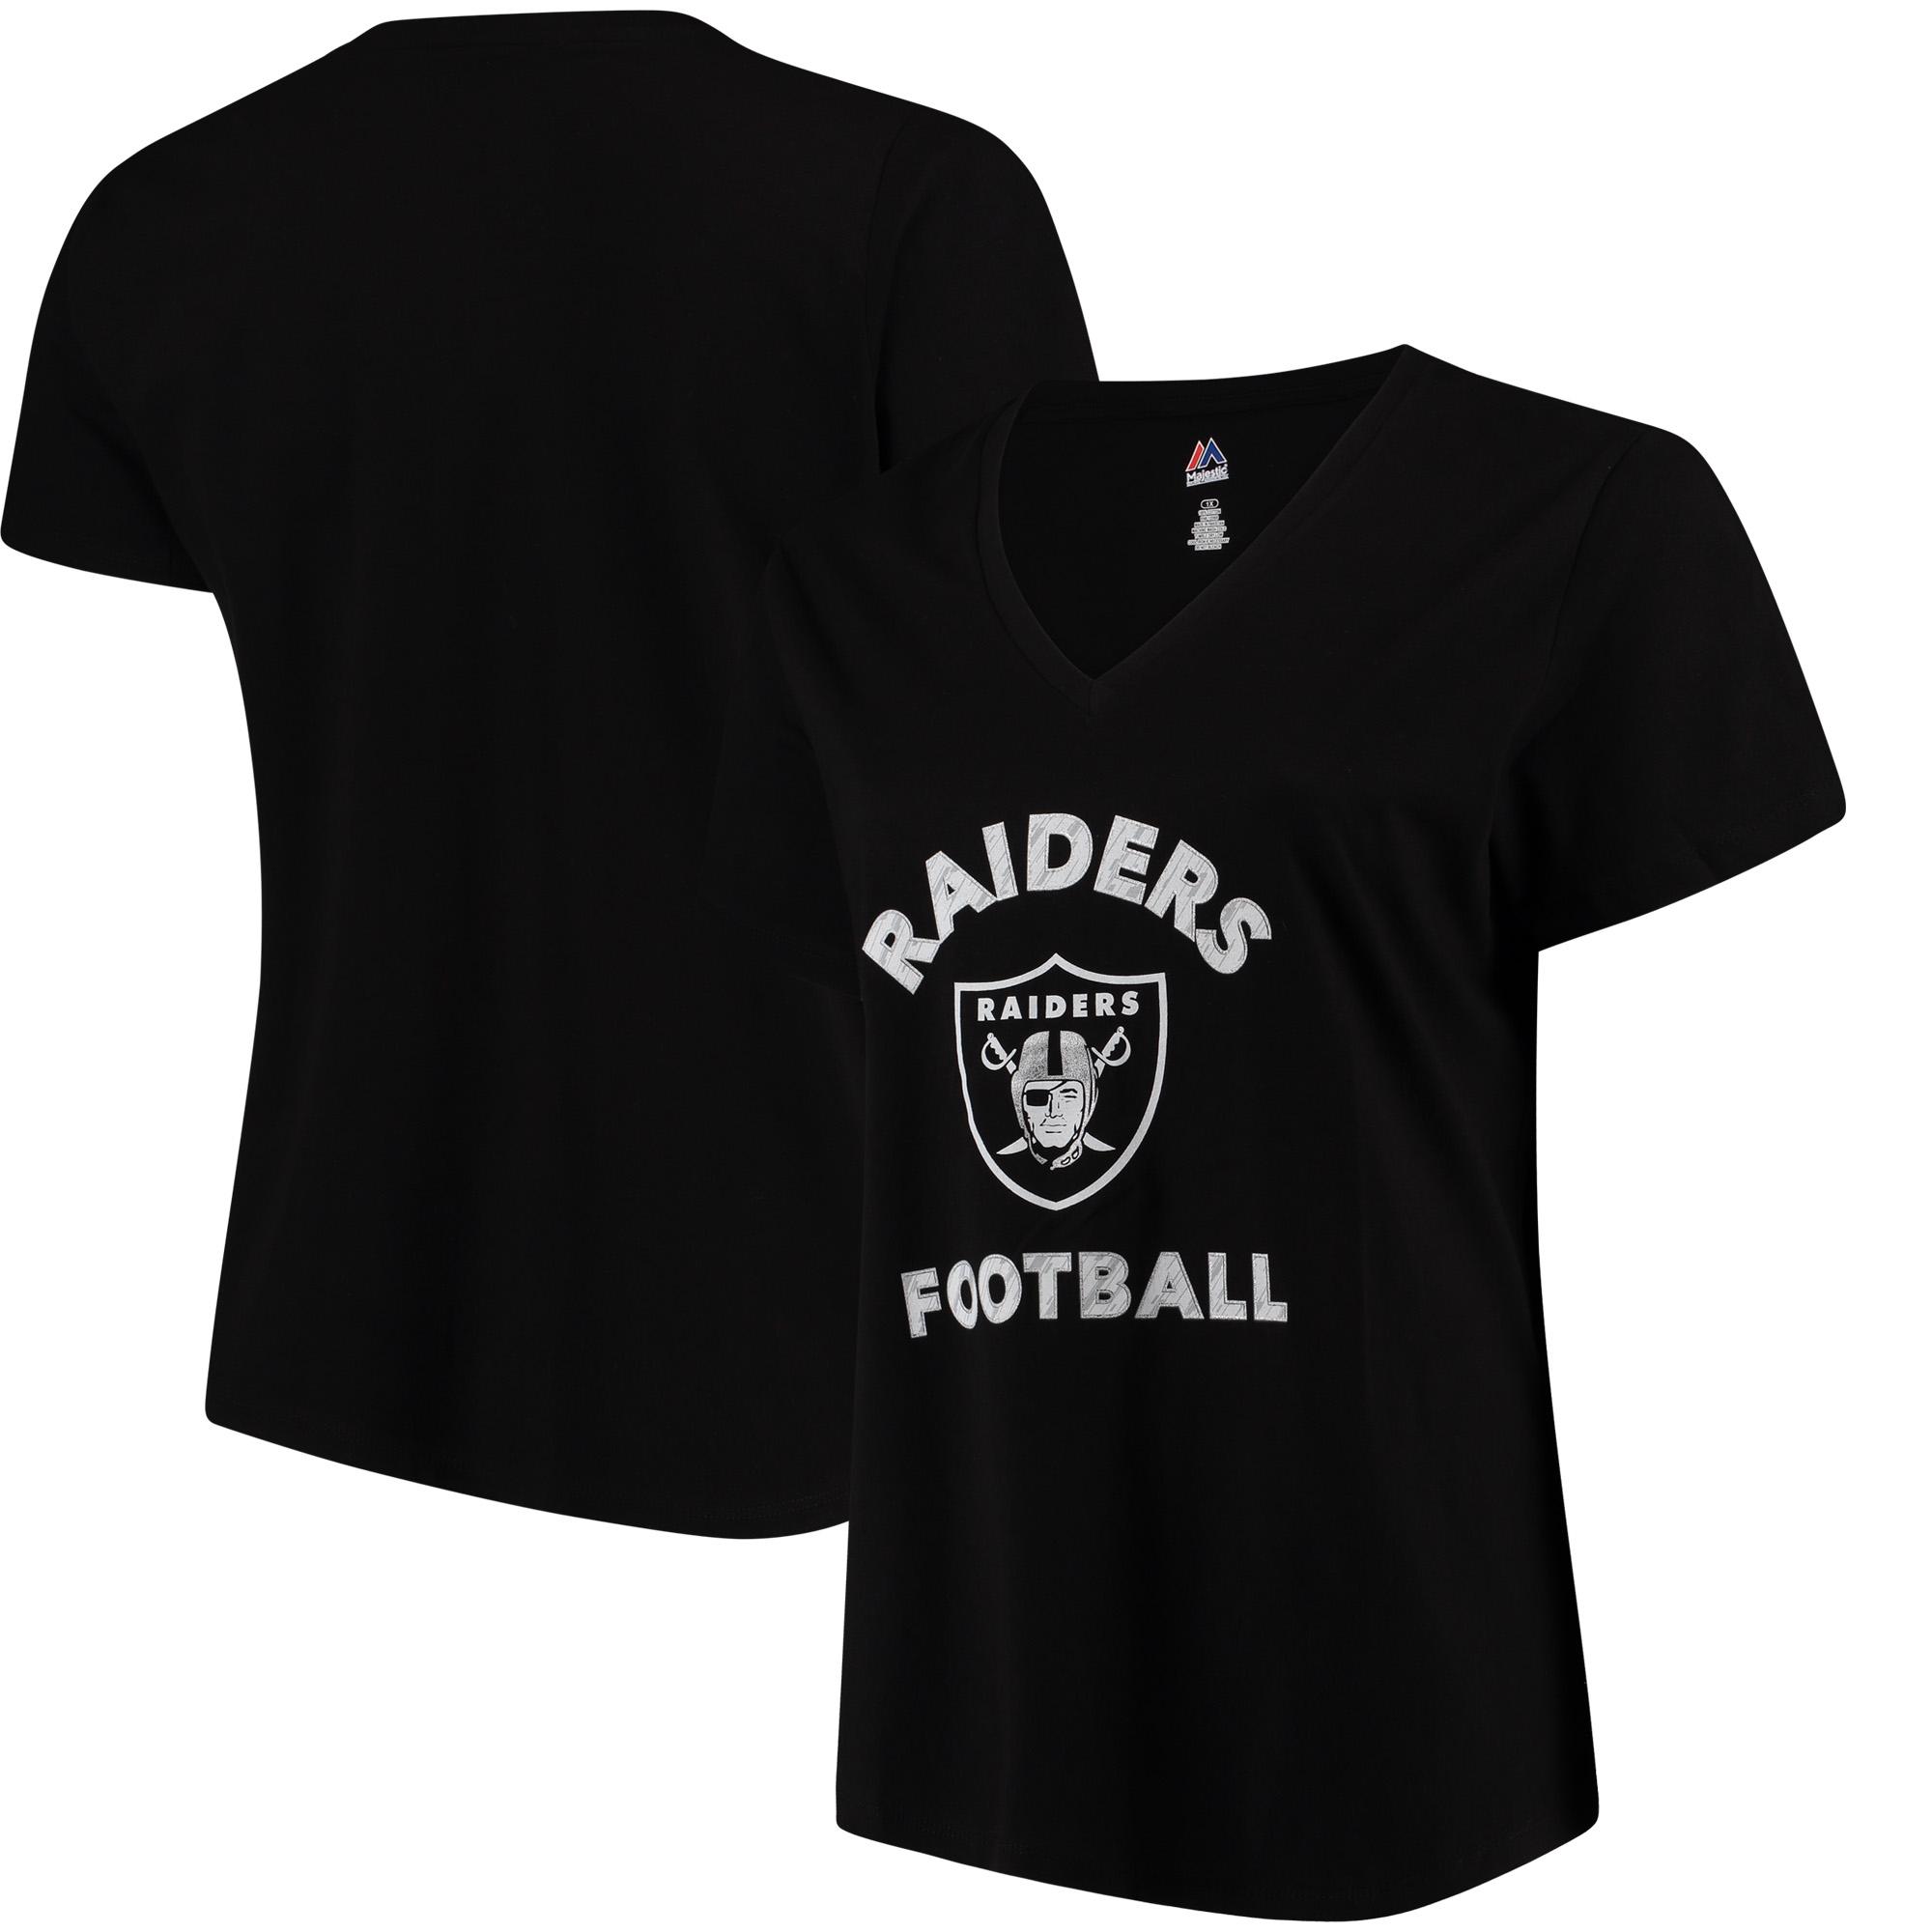 Oakland Raiders Majestic Women's Plus Size V-Neck T-Shirt - Black